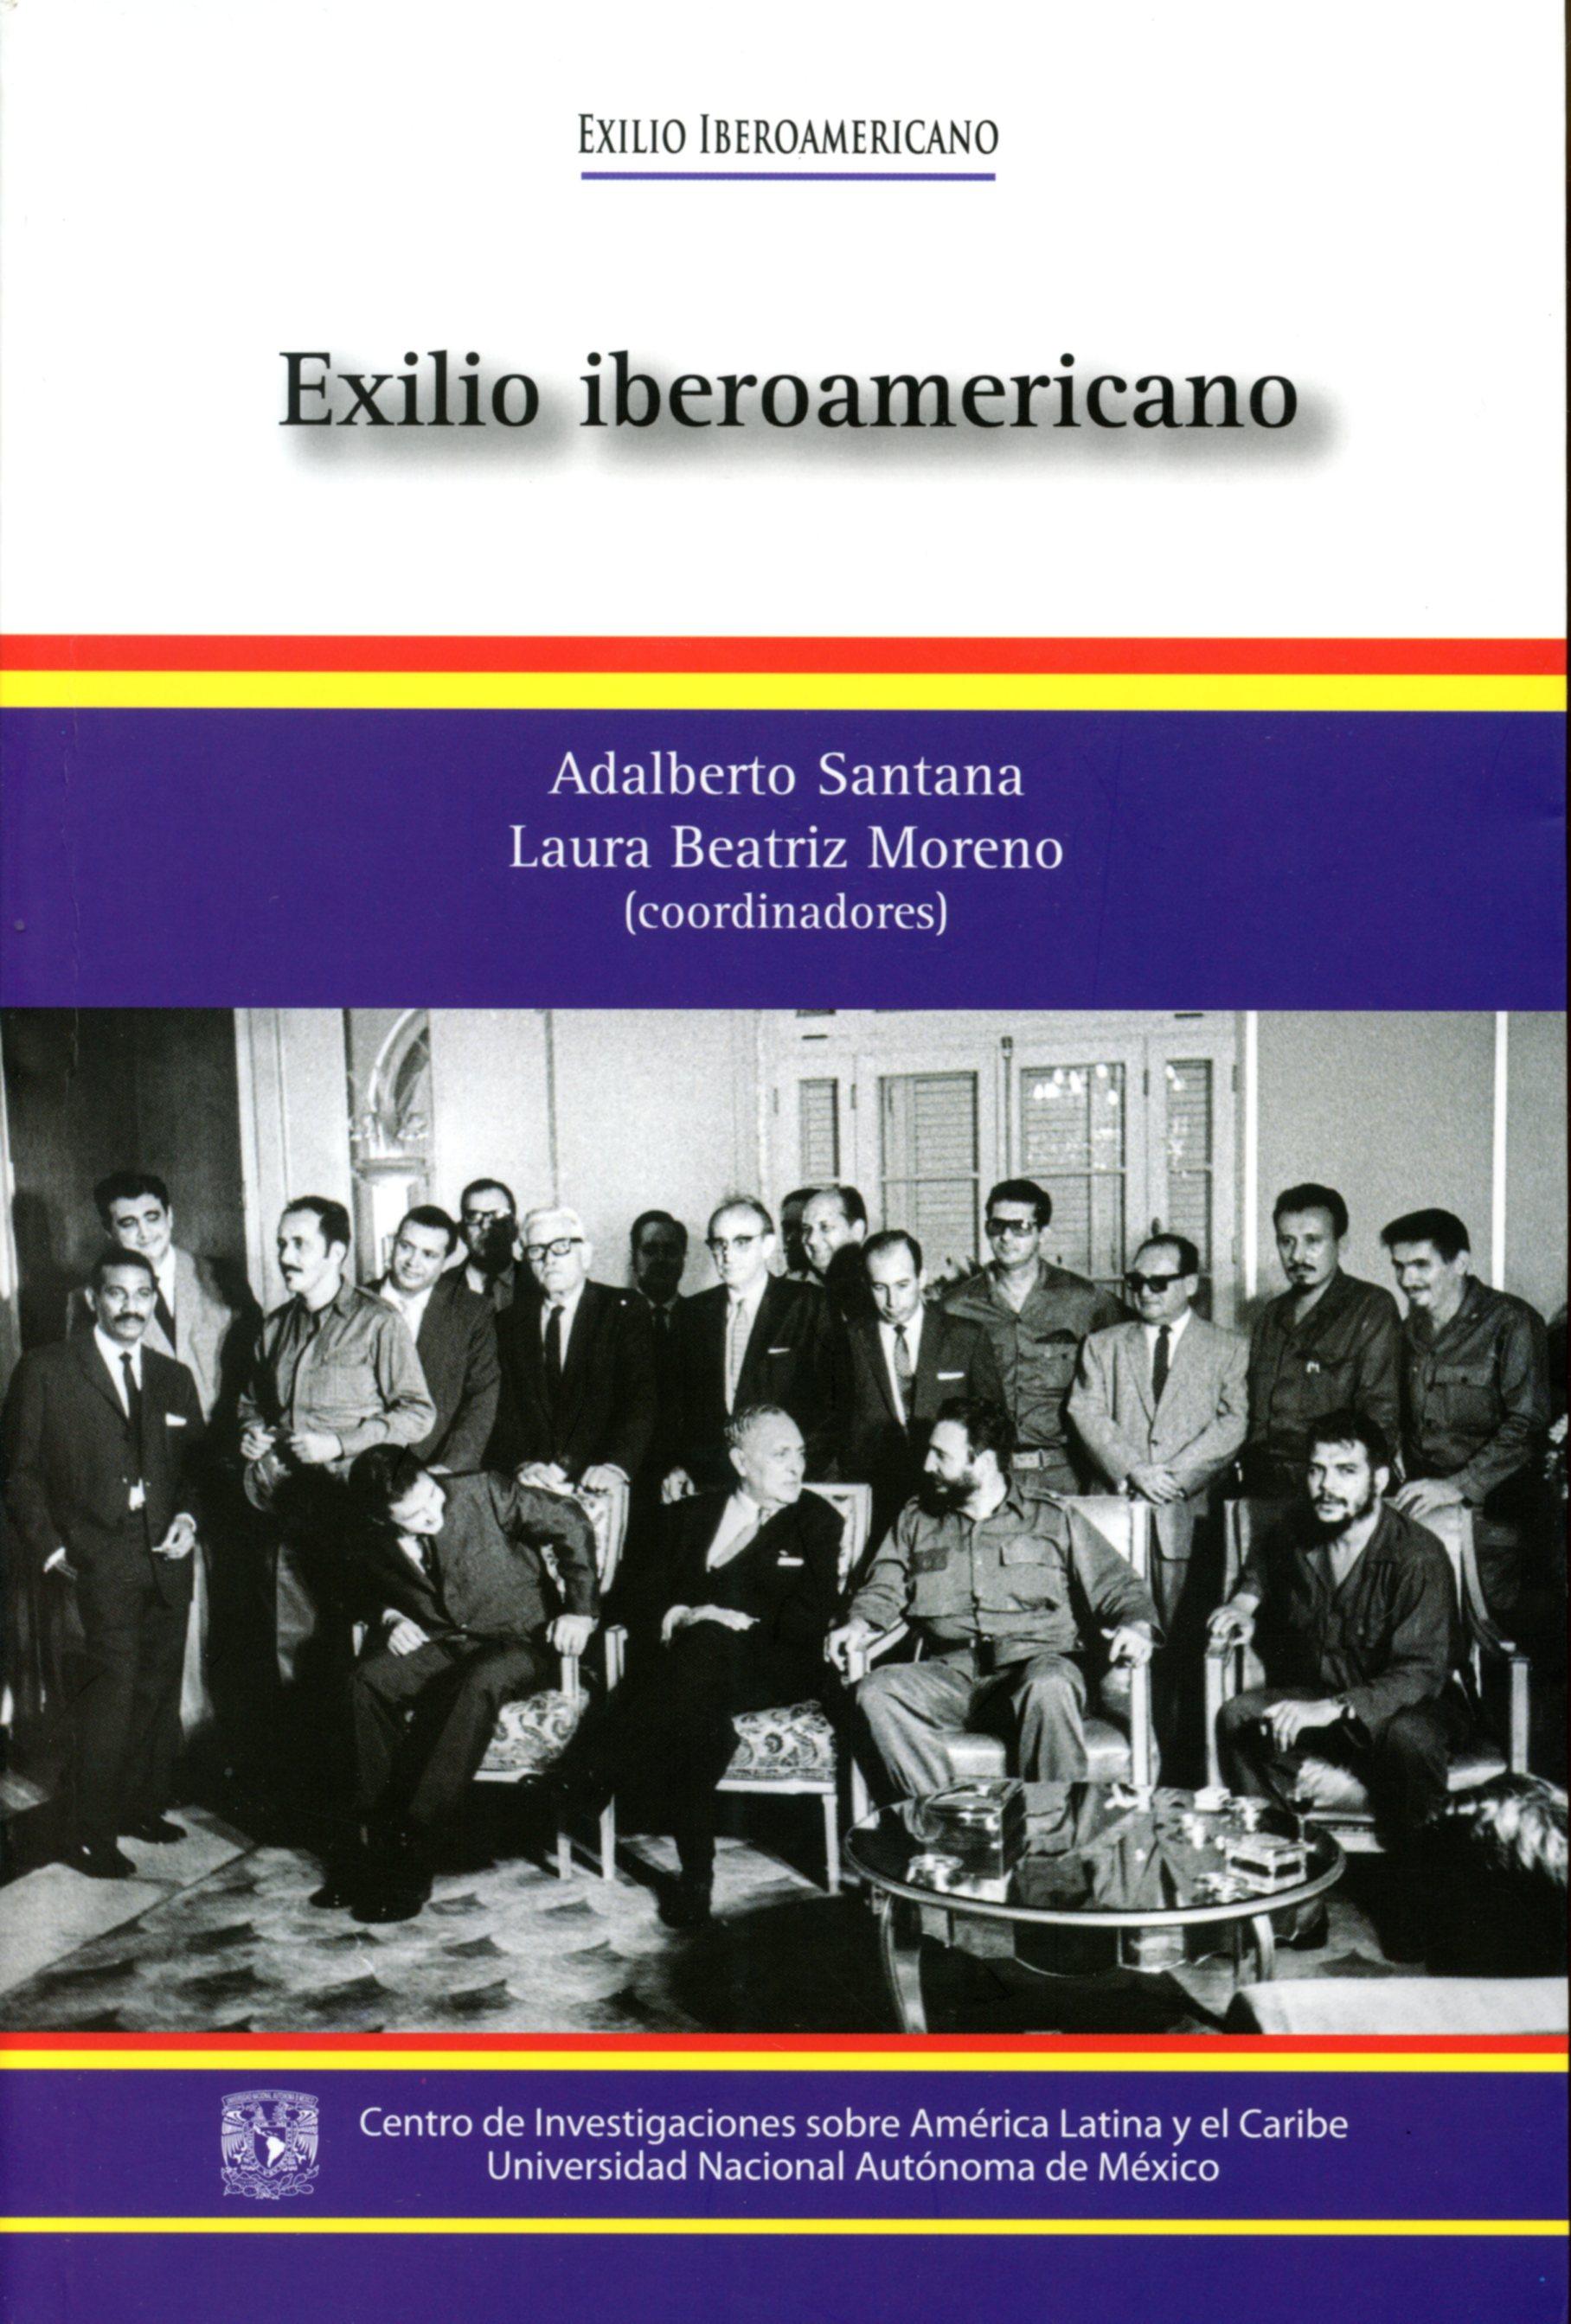 Exilio iberoamericano